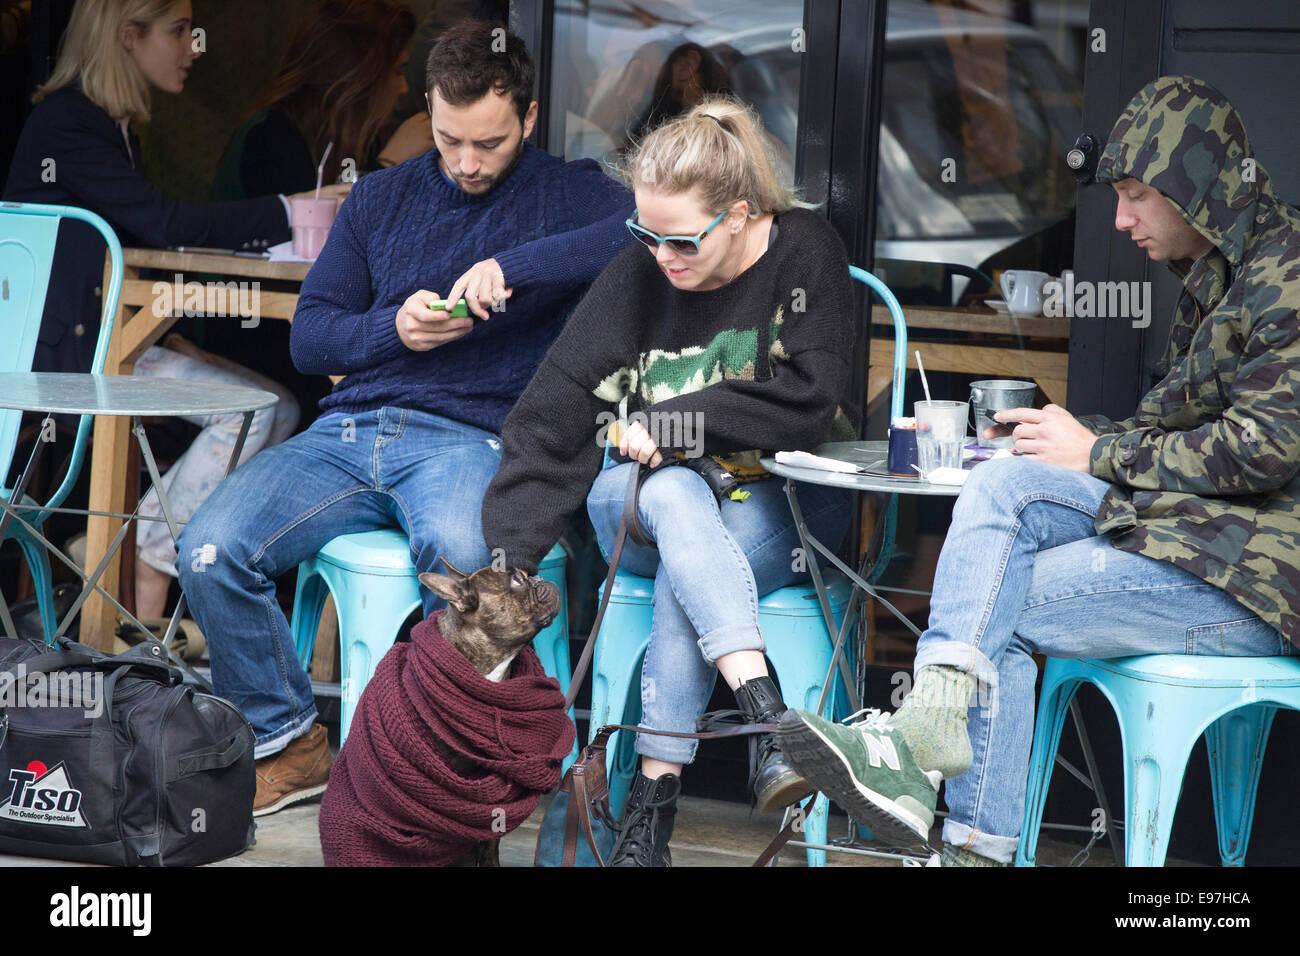 Franze & Evans trendy cafe Shoreditch sunday brunch - Stock Image